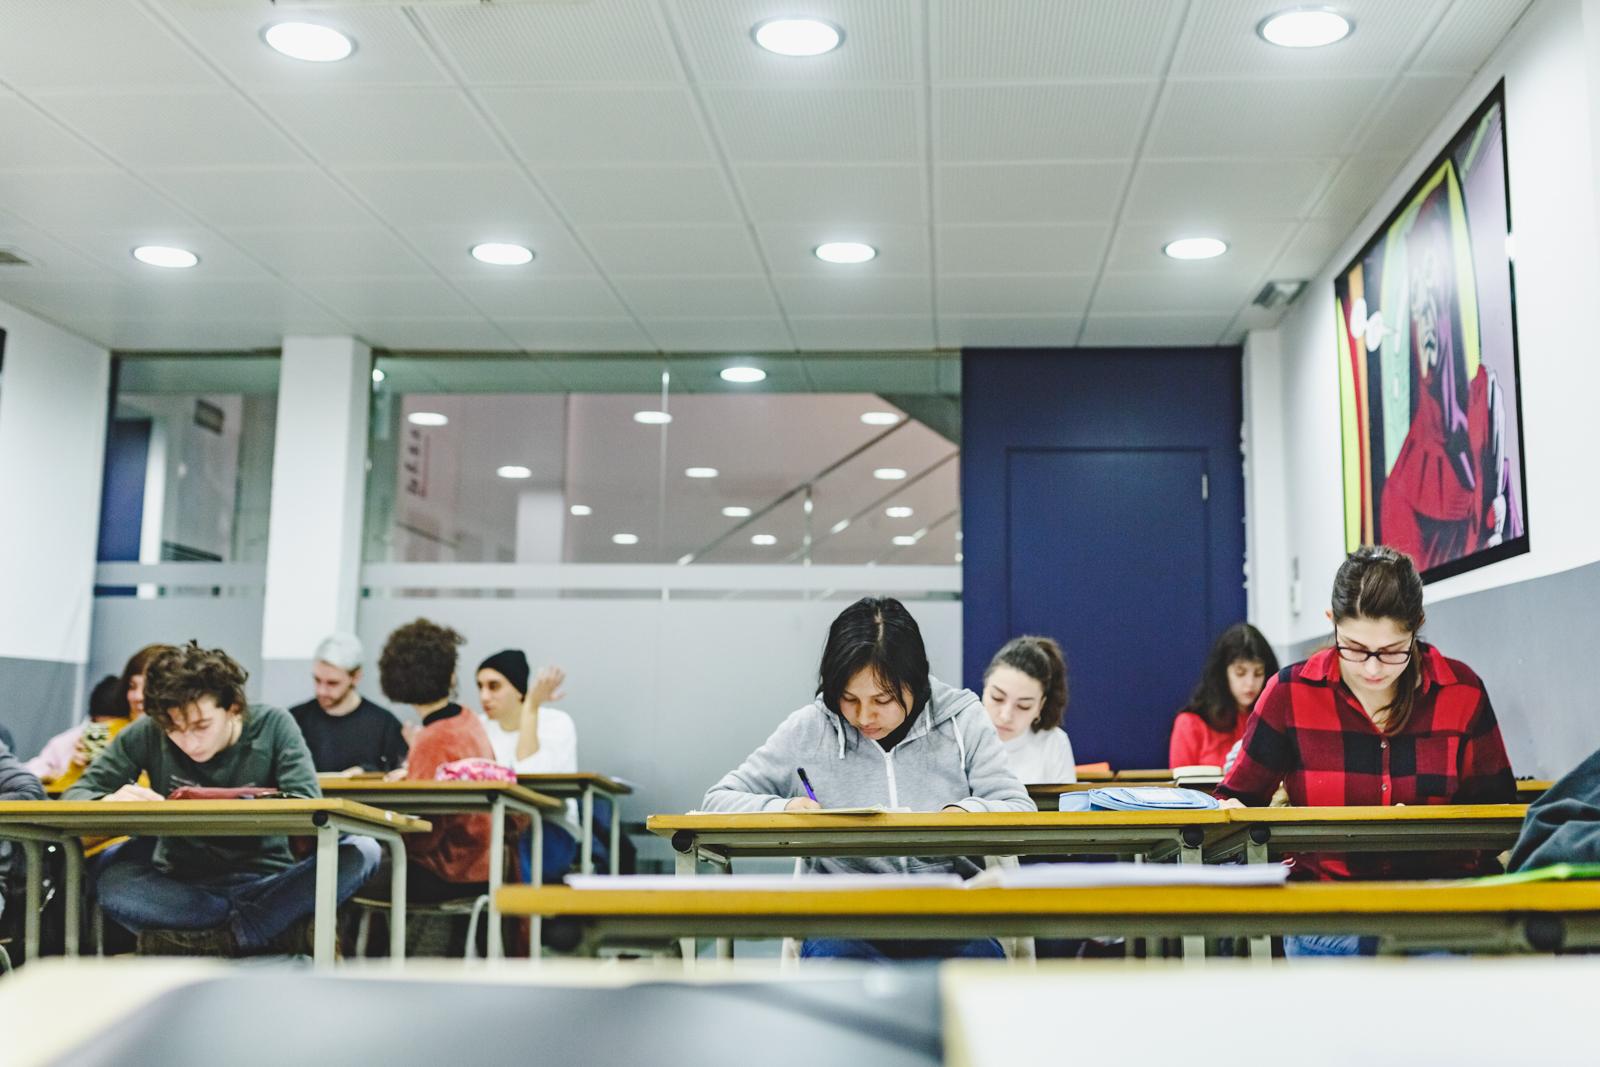 escuela-de-comic-joso-barcelona-fotografia-corporativa-misshappyflash-9.jpg